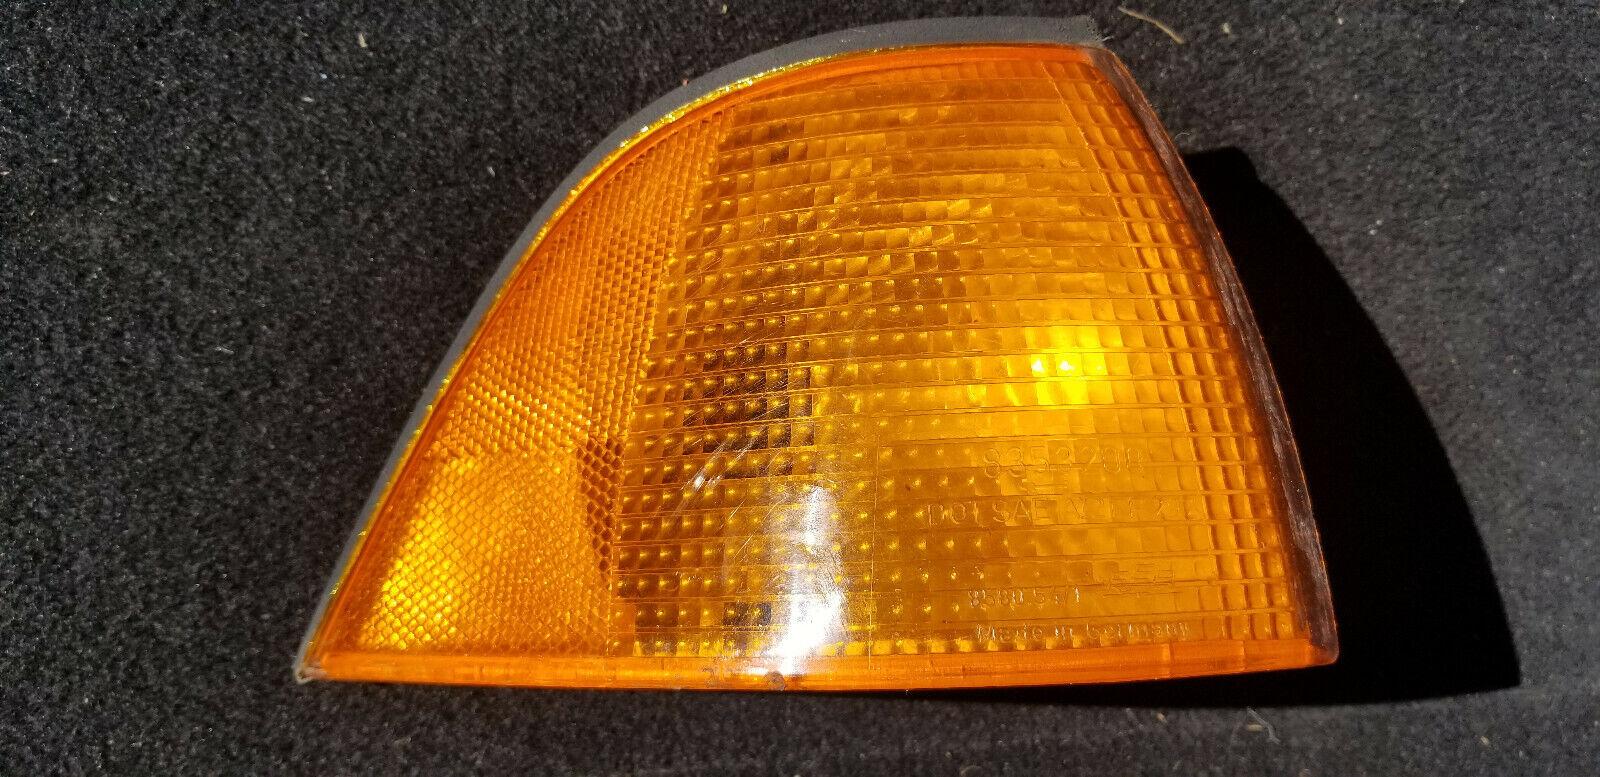 1992 1993 1994 1995 1996 1997 1998 BMW 3 Series M3 E36 Turn Signal Corner Lamp R